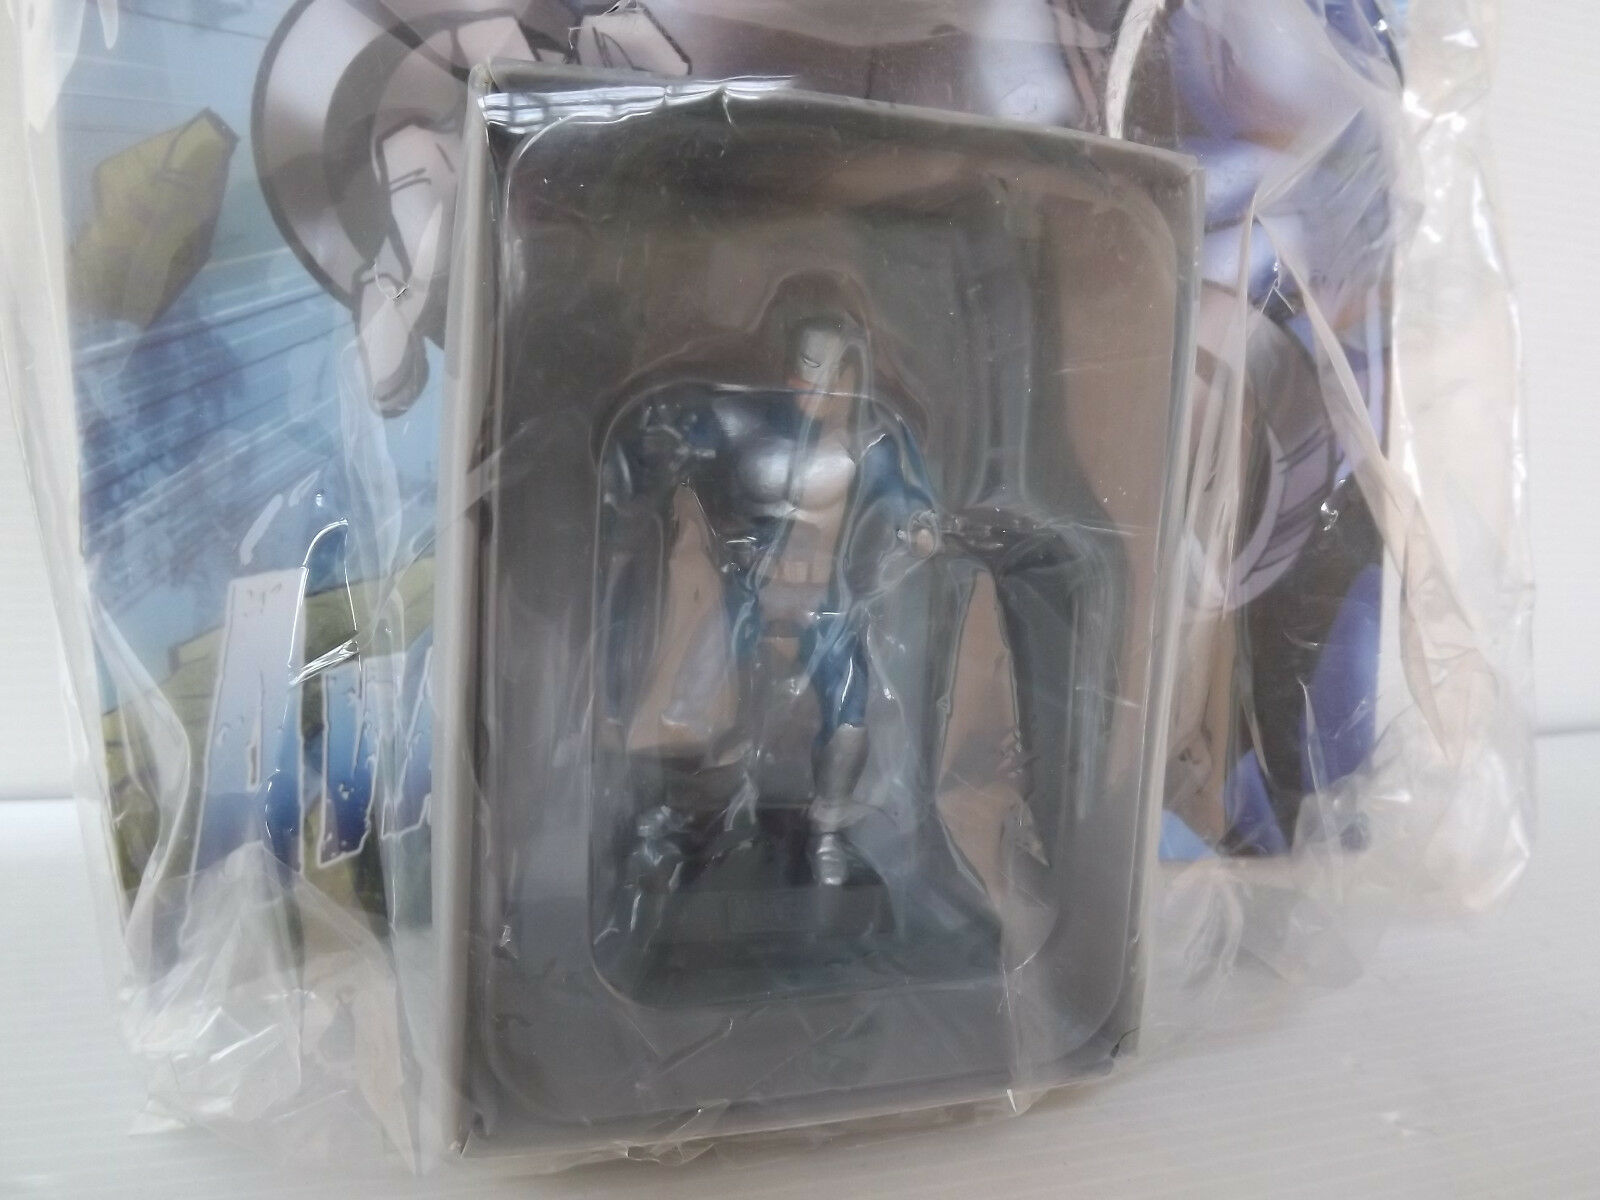 Avalanche - Figürchen Blei Eaglemoss The Classic Marvel - - - Neu 409c64